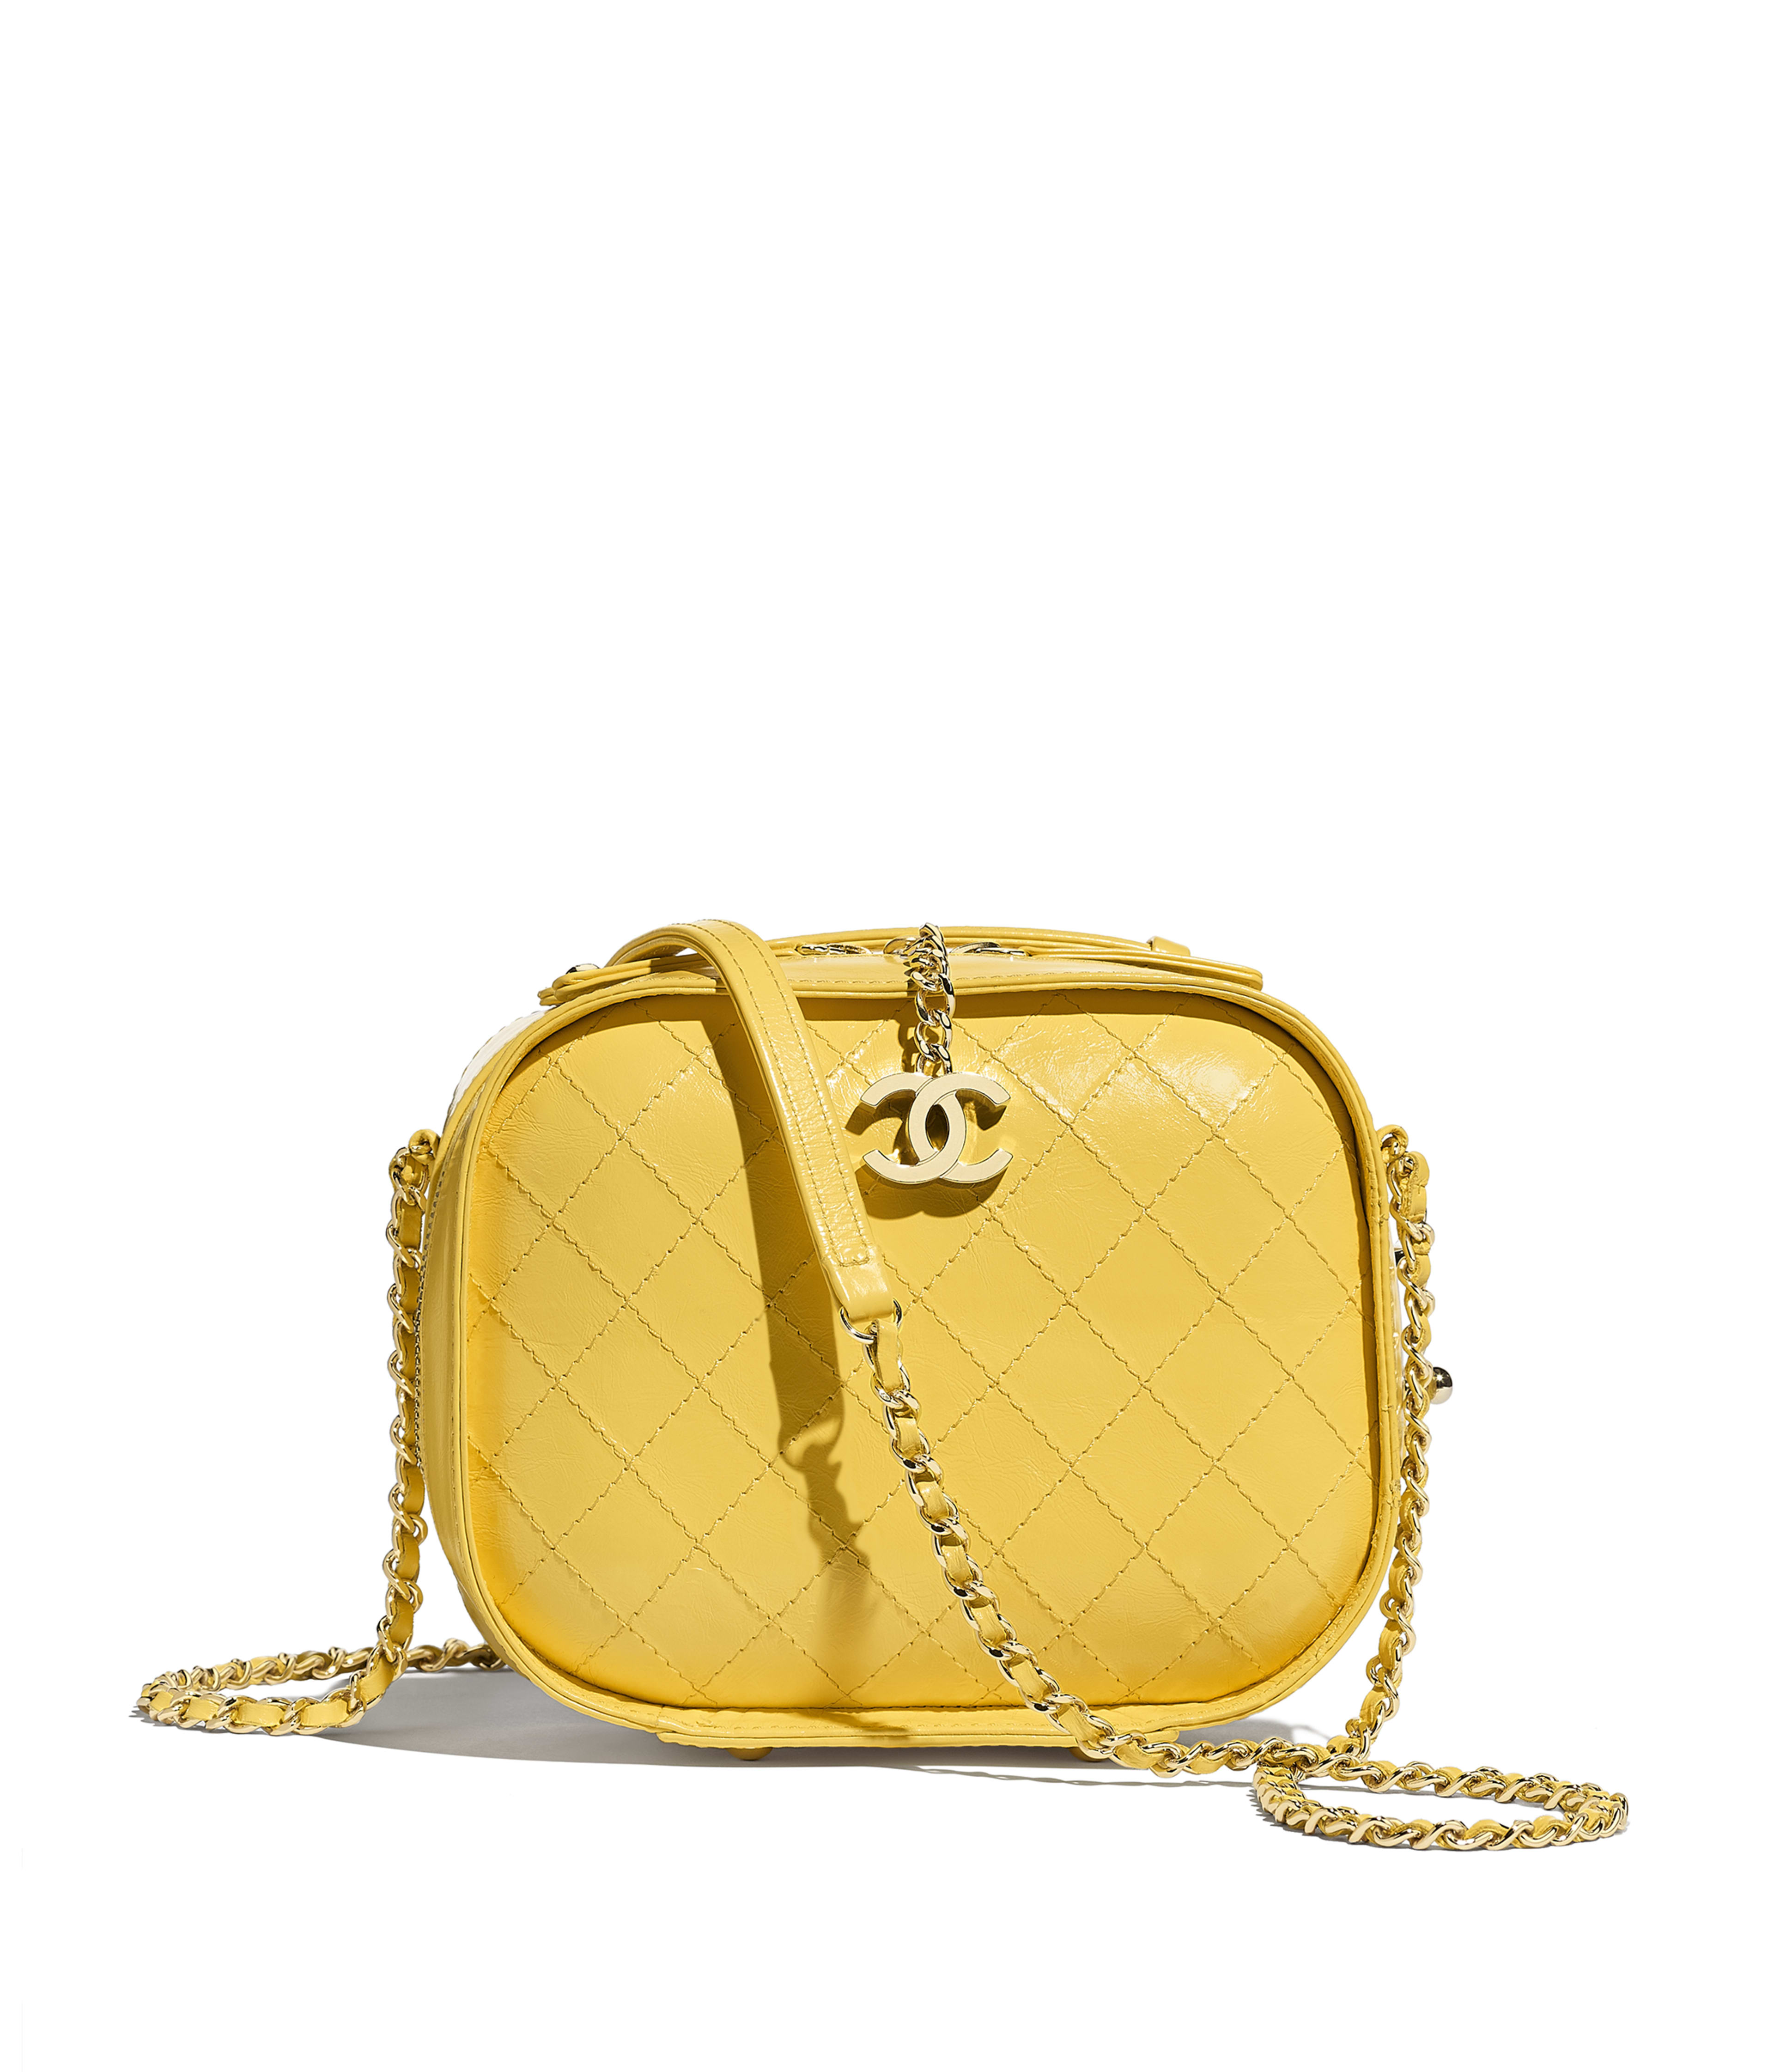 Vanity Case Crumpled Calfskin Gold Tone Metal Yellow Ref As0200y841445b642